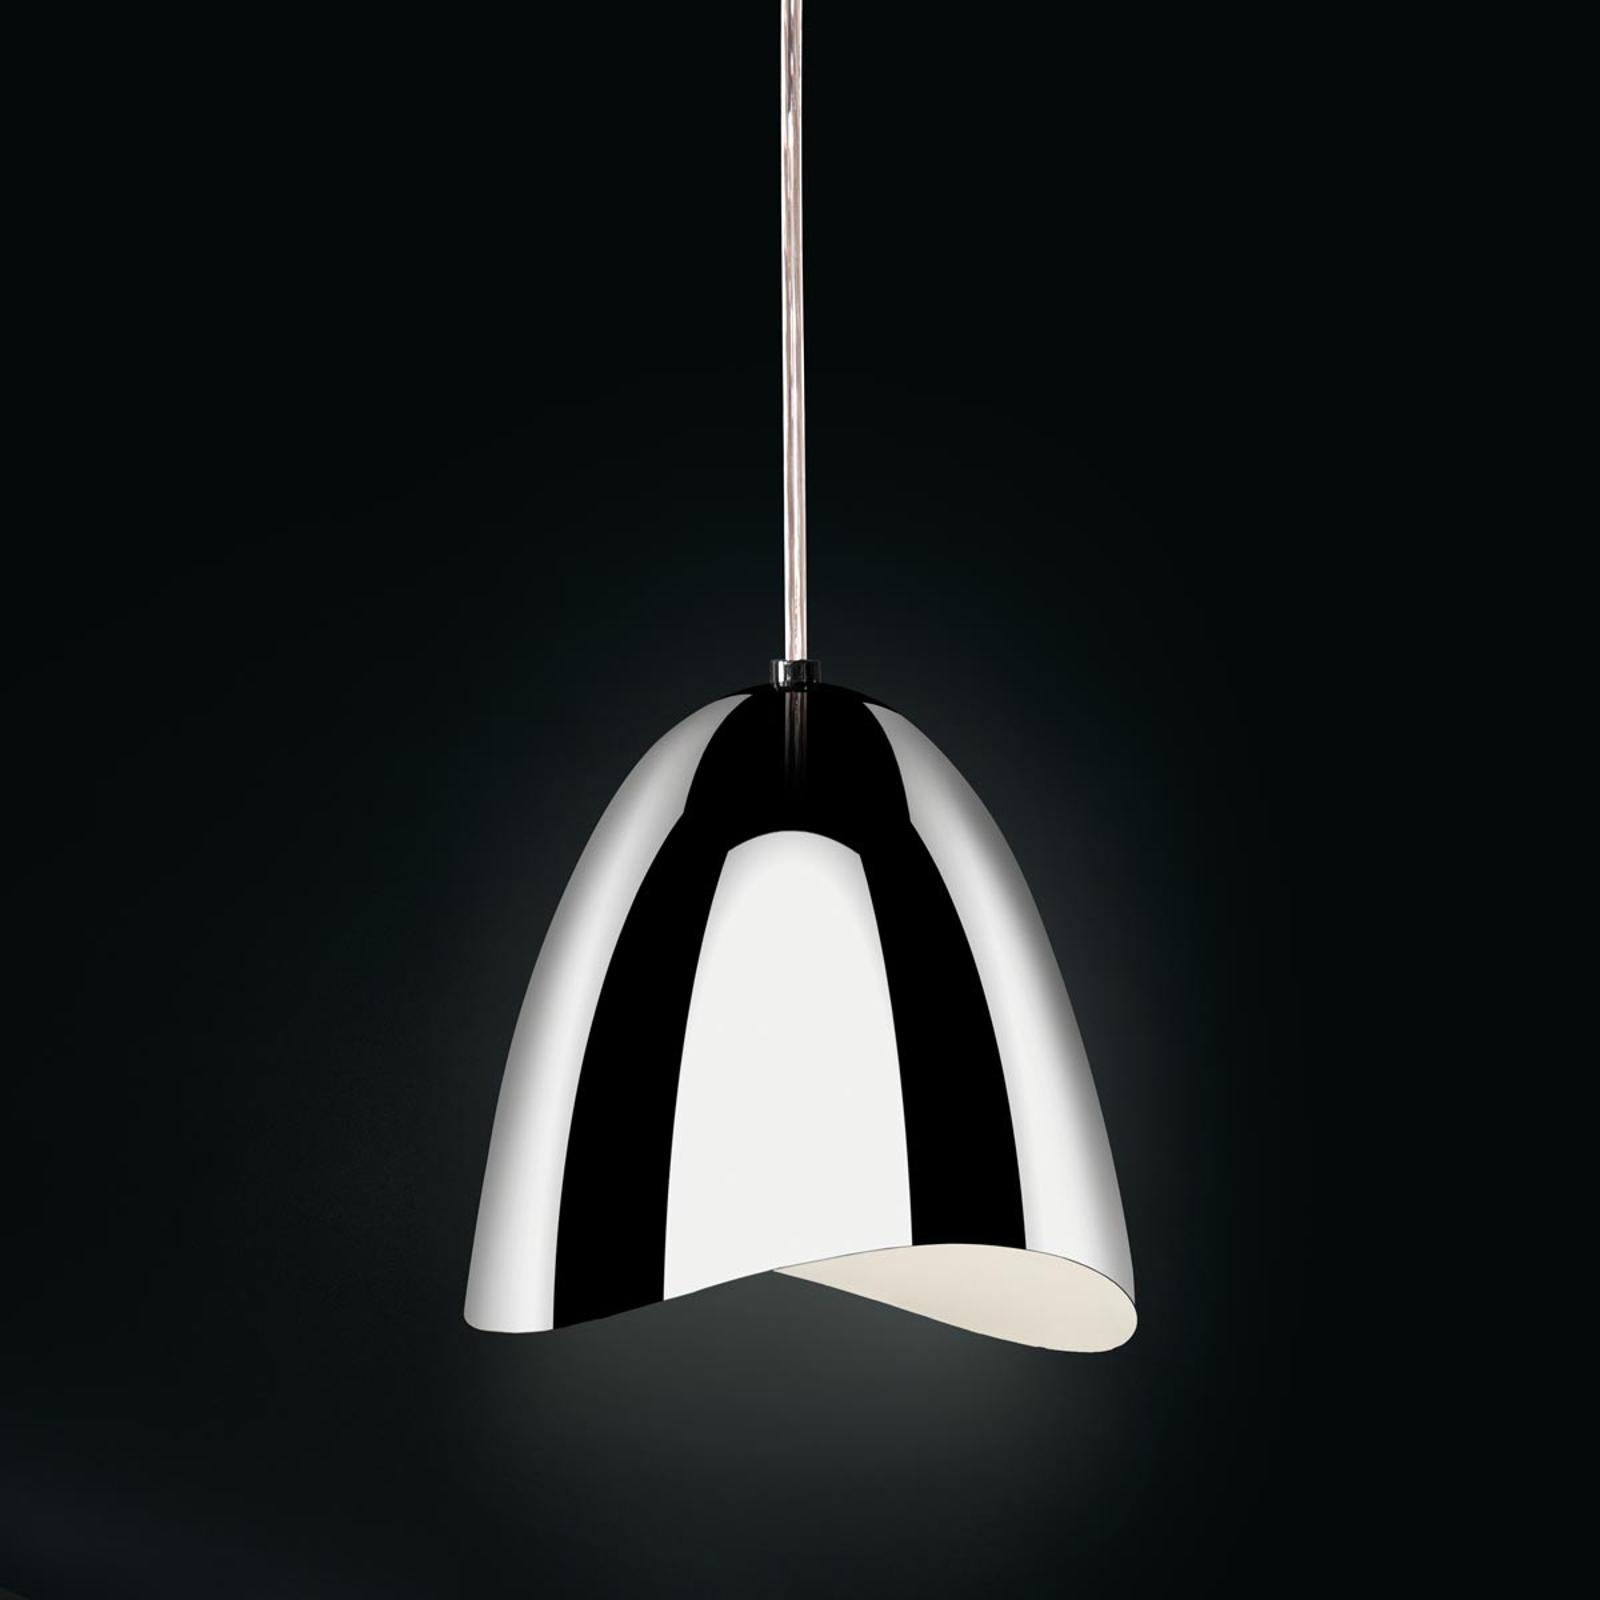 Lampada a sospensione LED Mirage, cromo lucido